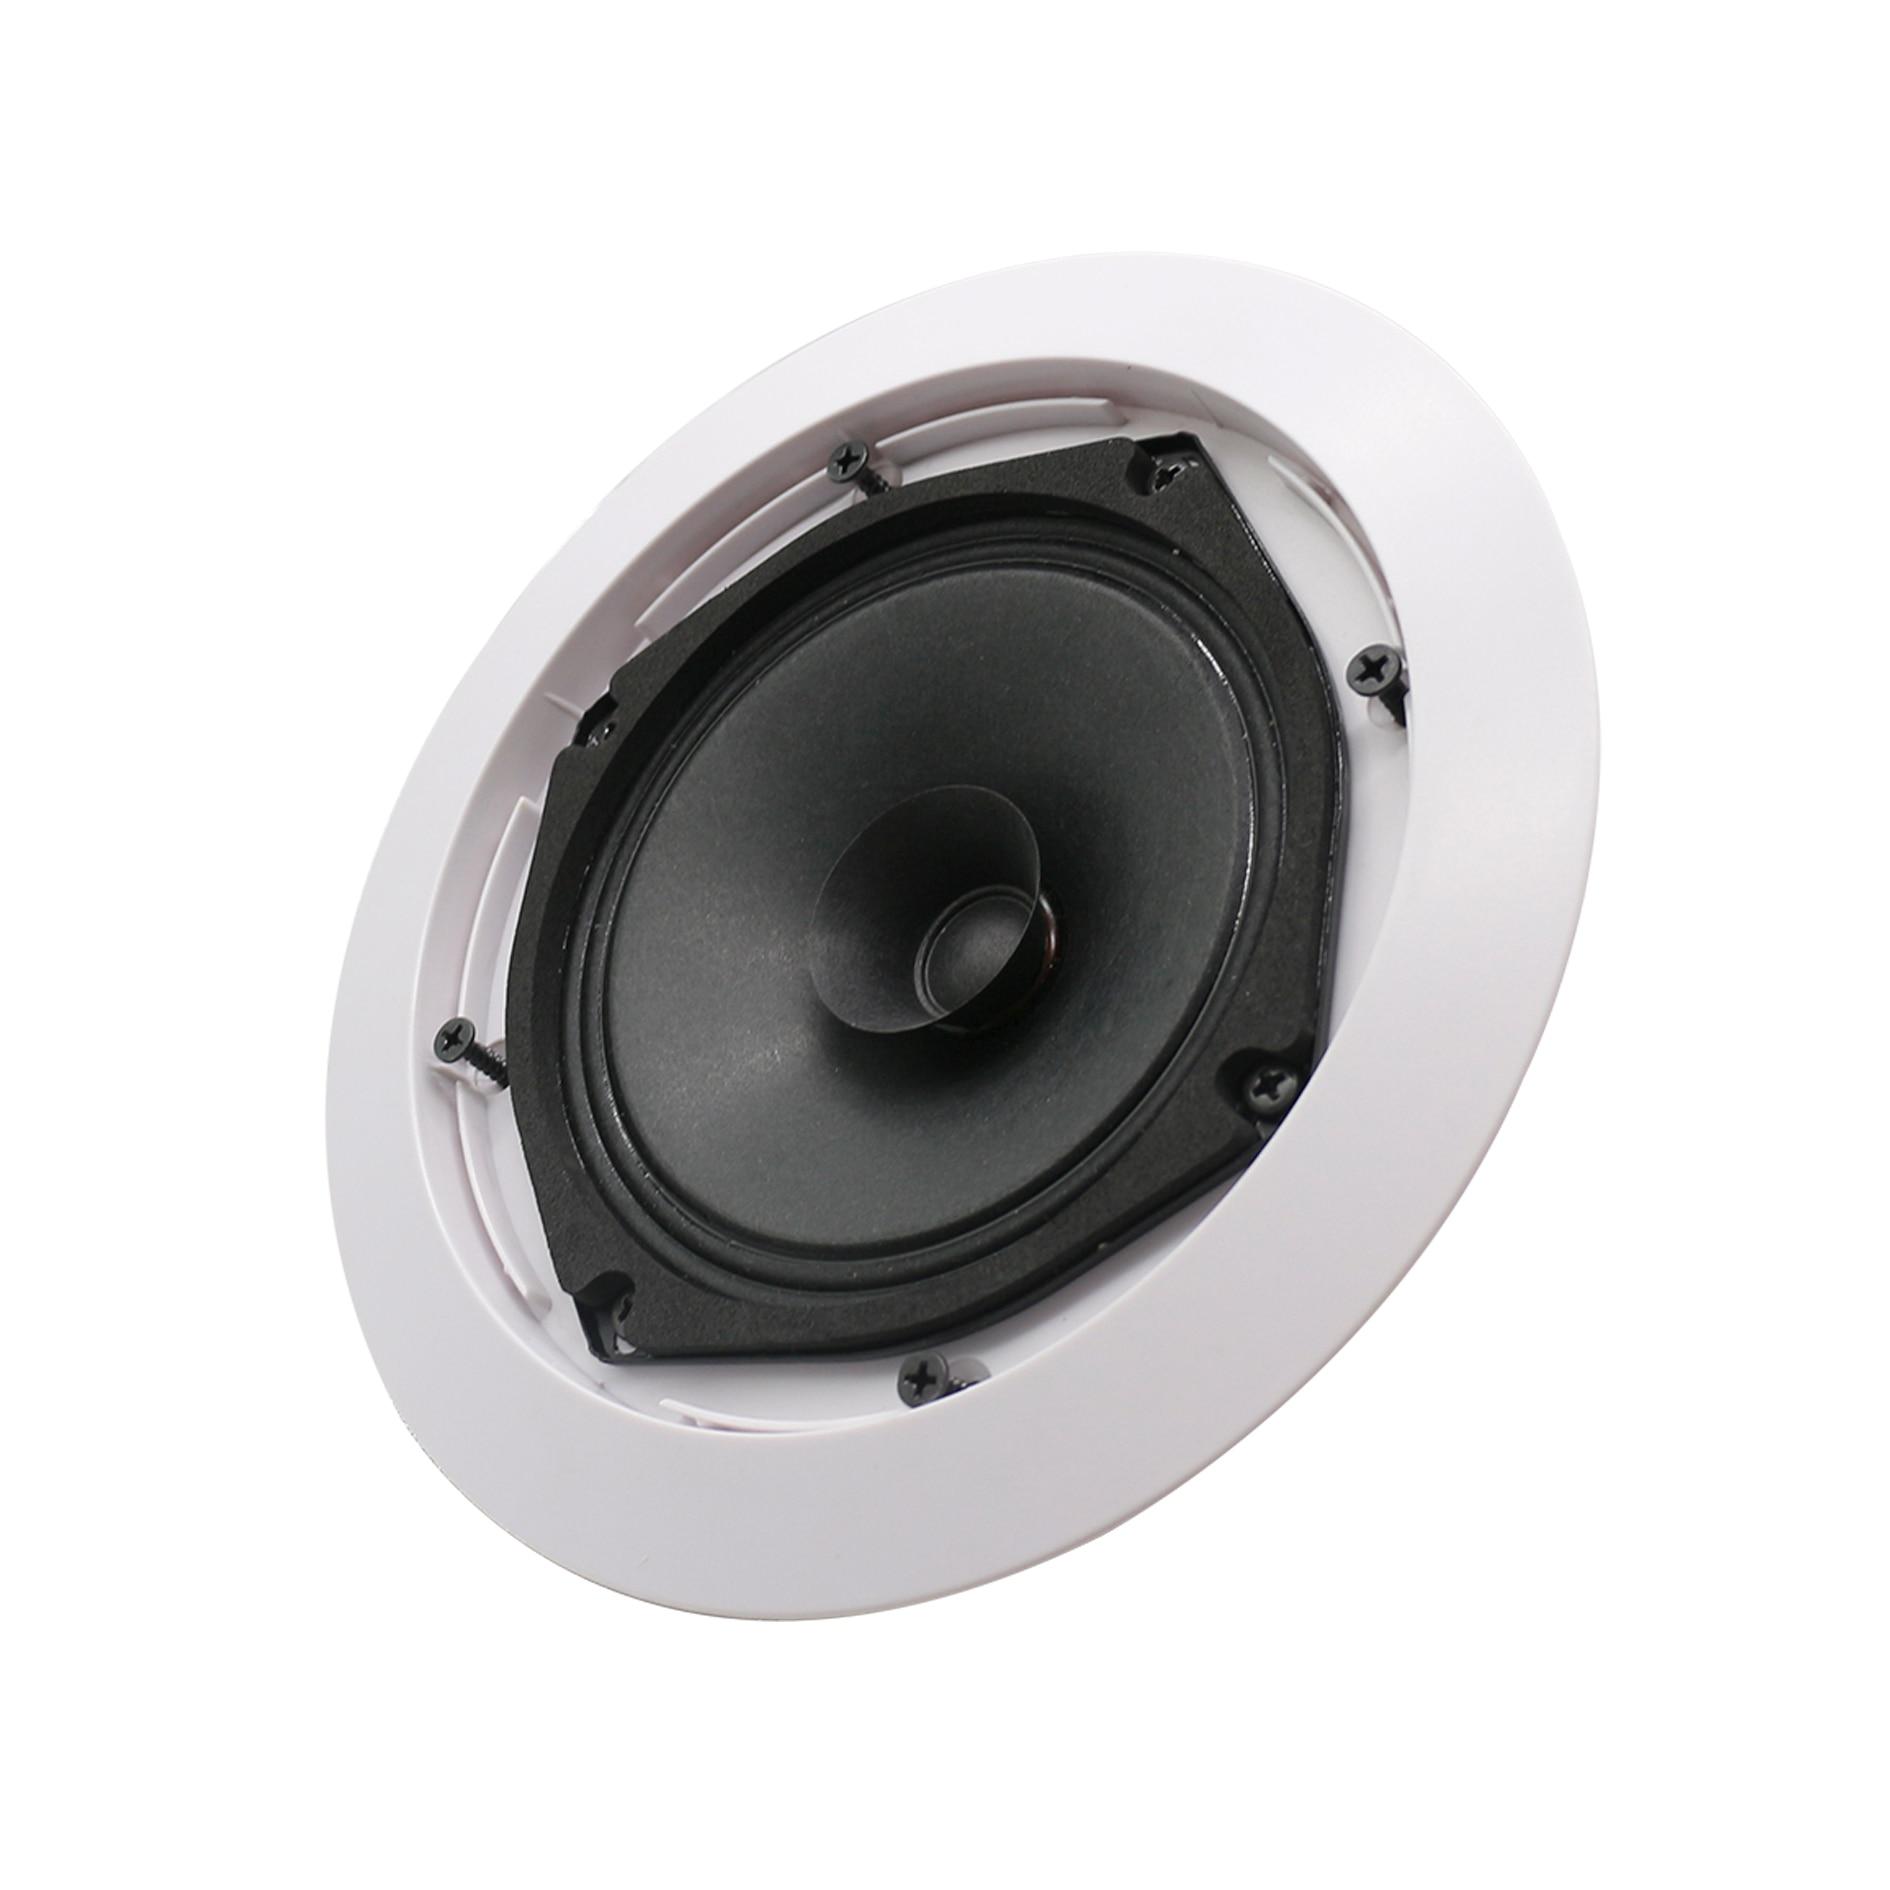 315104 Bluetooth In Decke Lautsprecher Home Audio Lautsprecher in Pairs 15W 5 Zoll 8 Ohm Aktive Drahtlose Backgroud Musik PA system